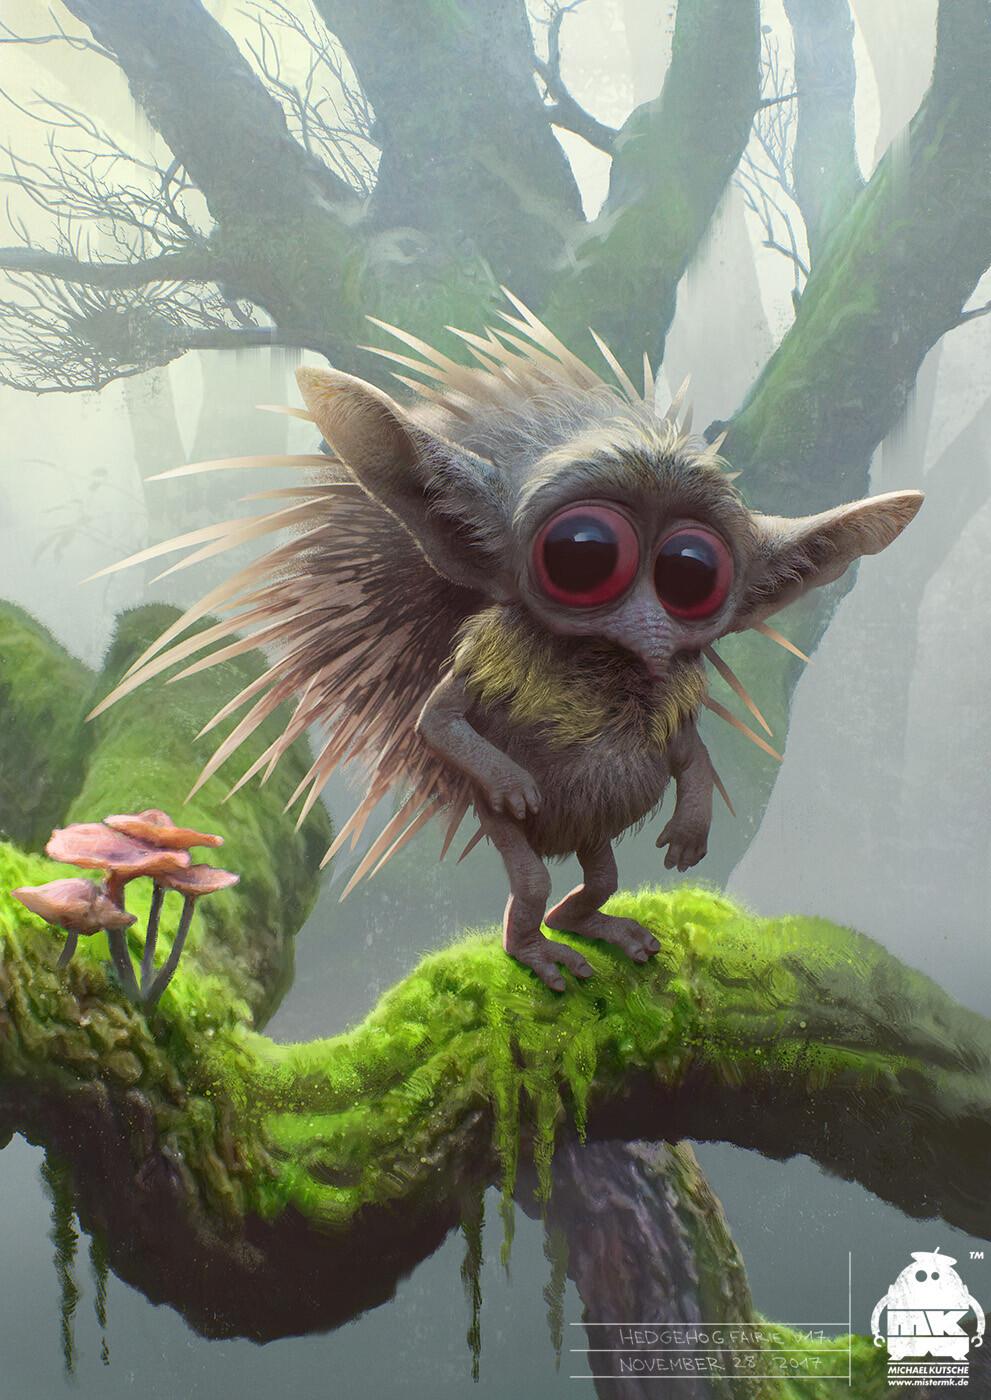 Artstation Maleficent 2 Hedgehog Fairie Character Design